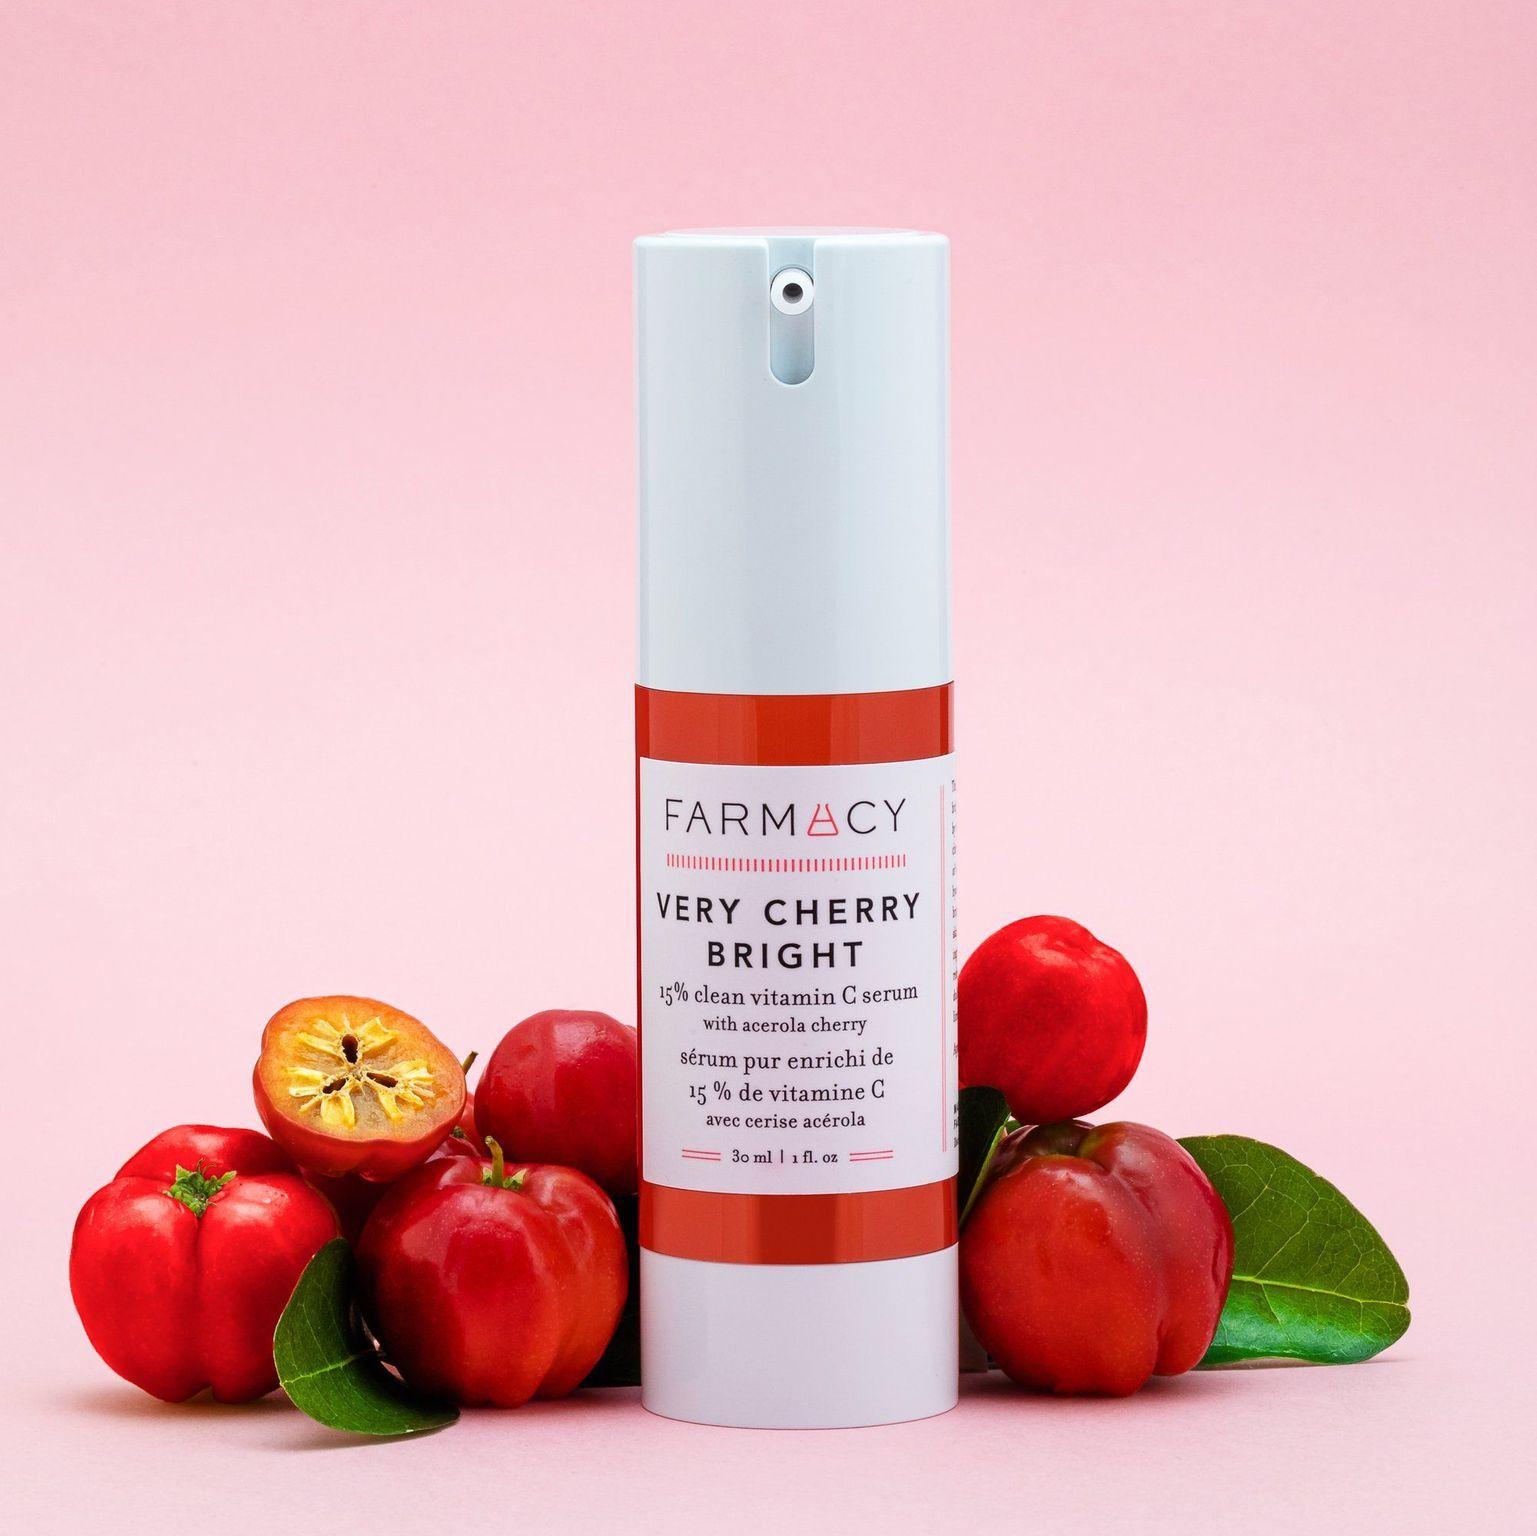 Very Cherry Bright 15% Clean Vitamin C Serum with Acerola Cherry